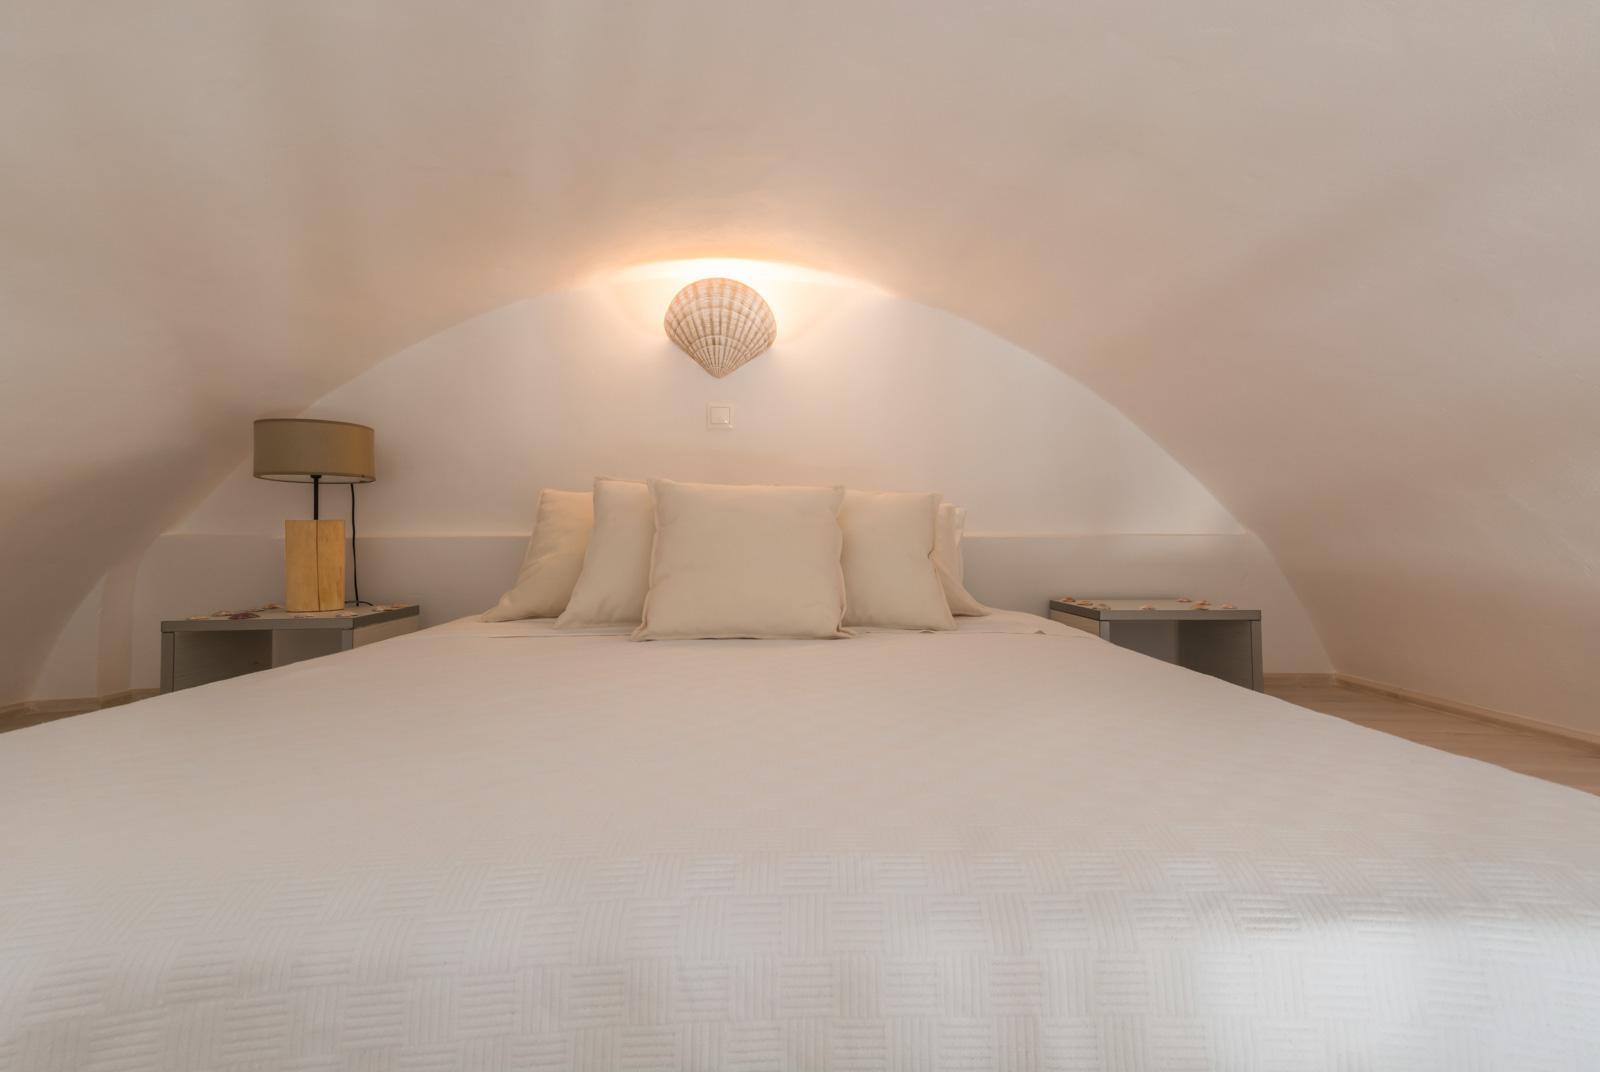 santorini villas 5 bedrooms